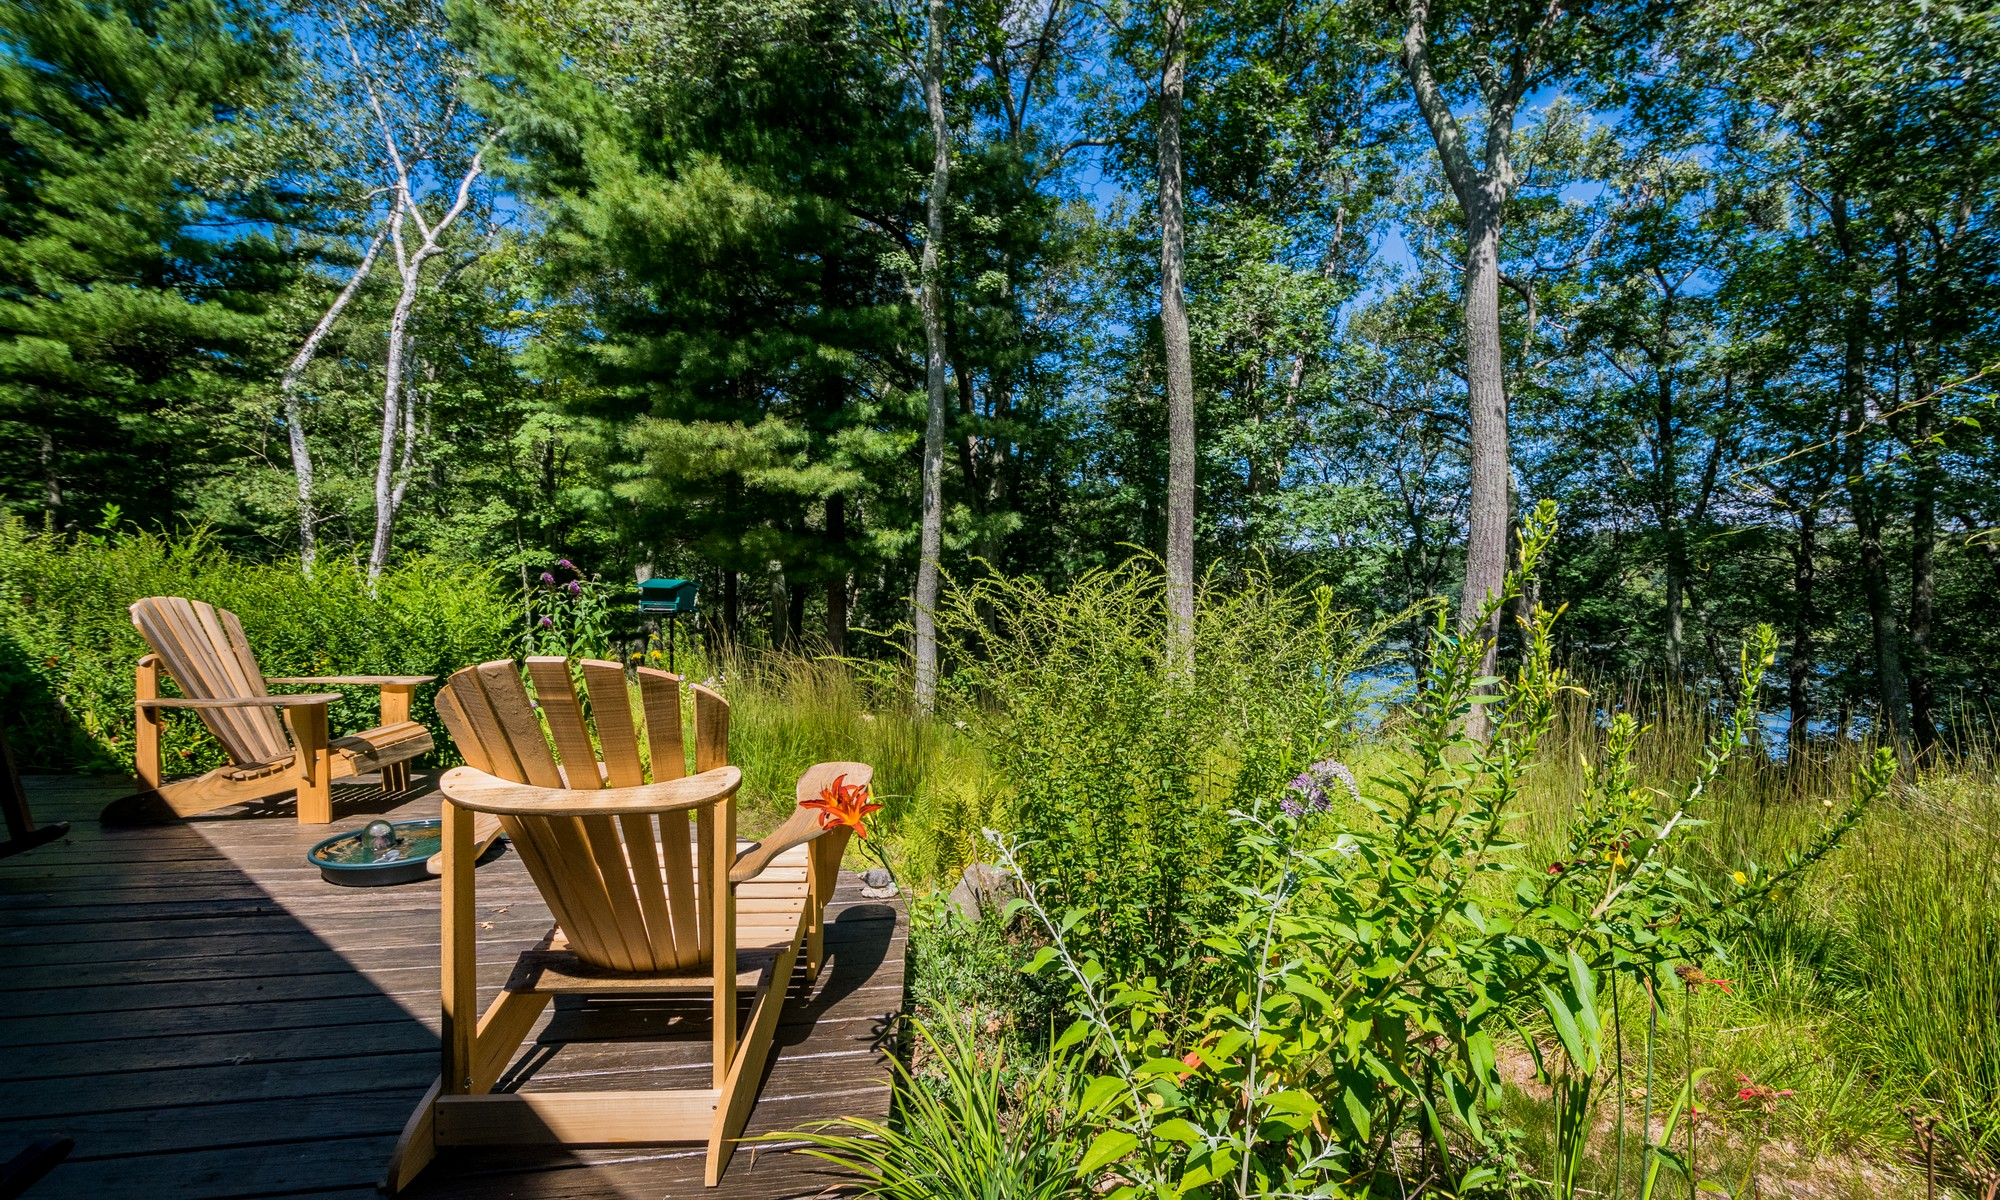 Terreno para Venda às Spectacular Pond Views 12 Huntley Lane Lincoln, Massachusetts 01773 Estados Unidos